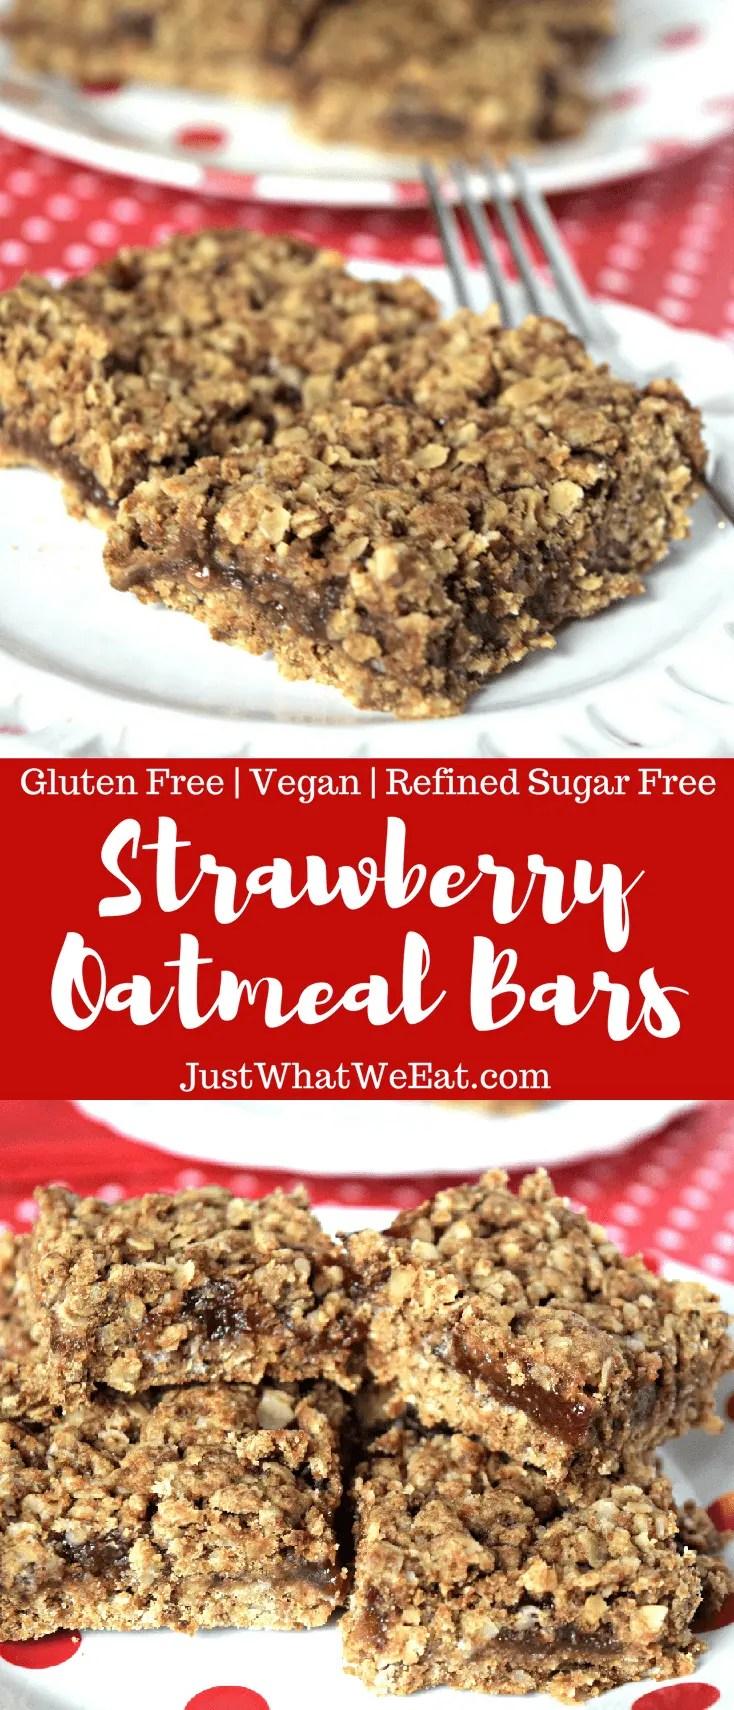 Strawberry Oatmeal Bars - Gluten Free, Vegan, & Refined Sugar Free